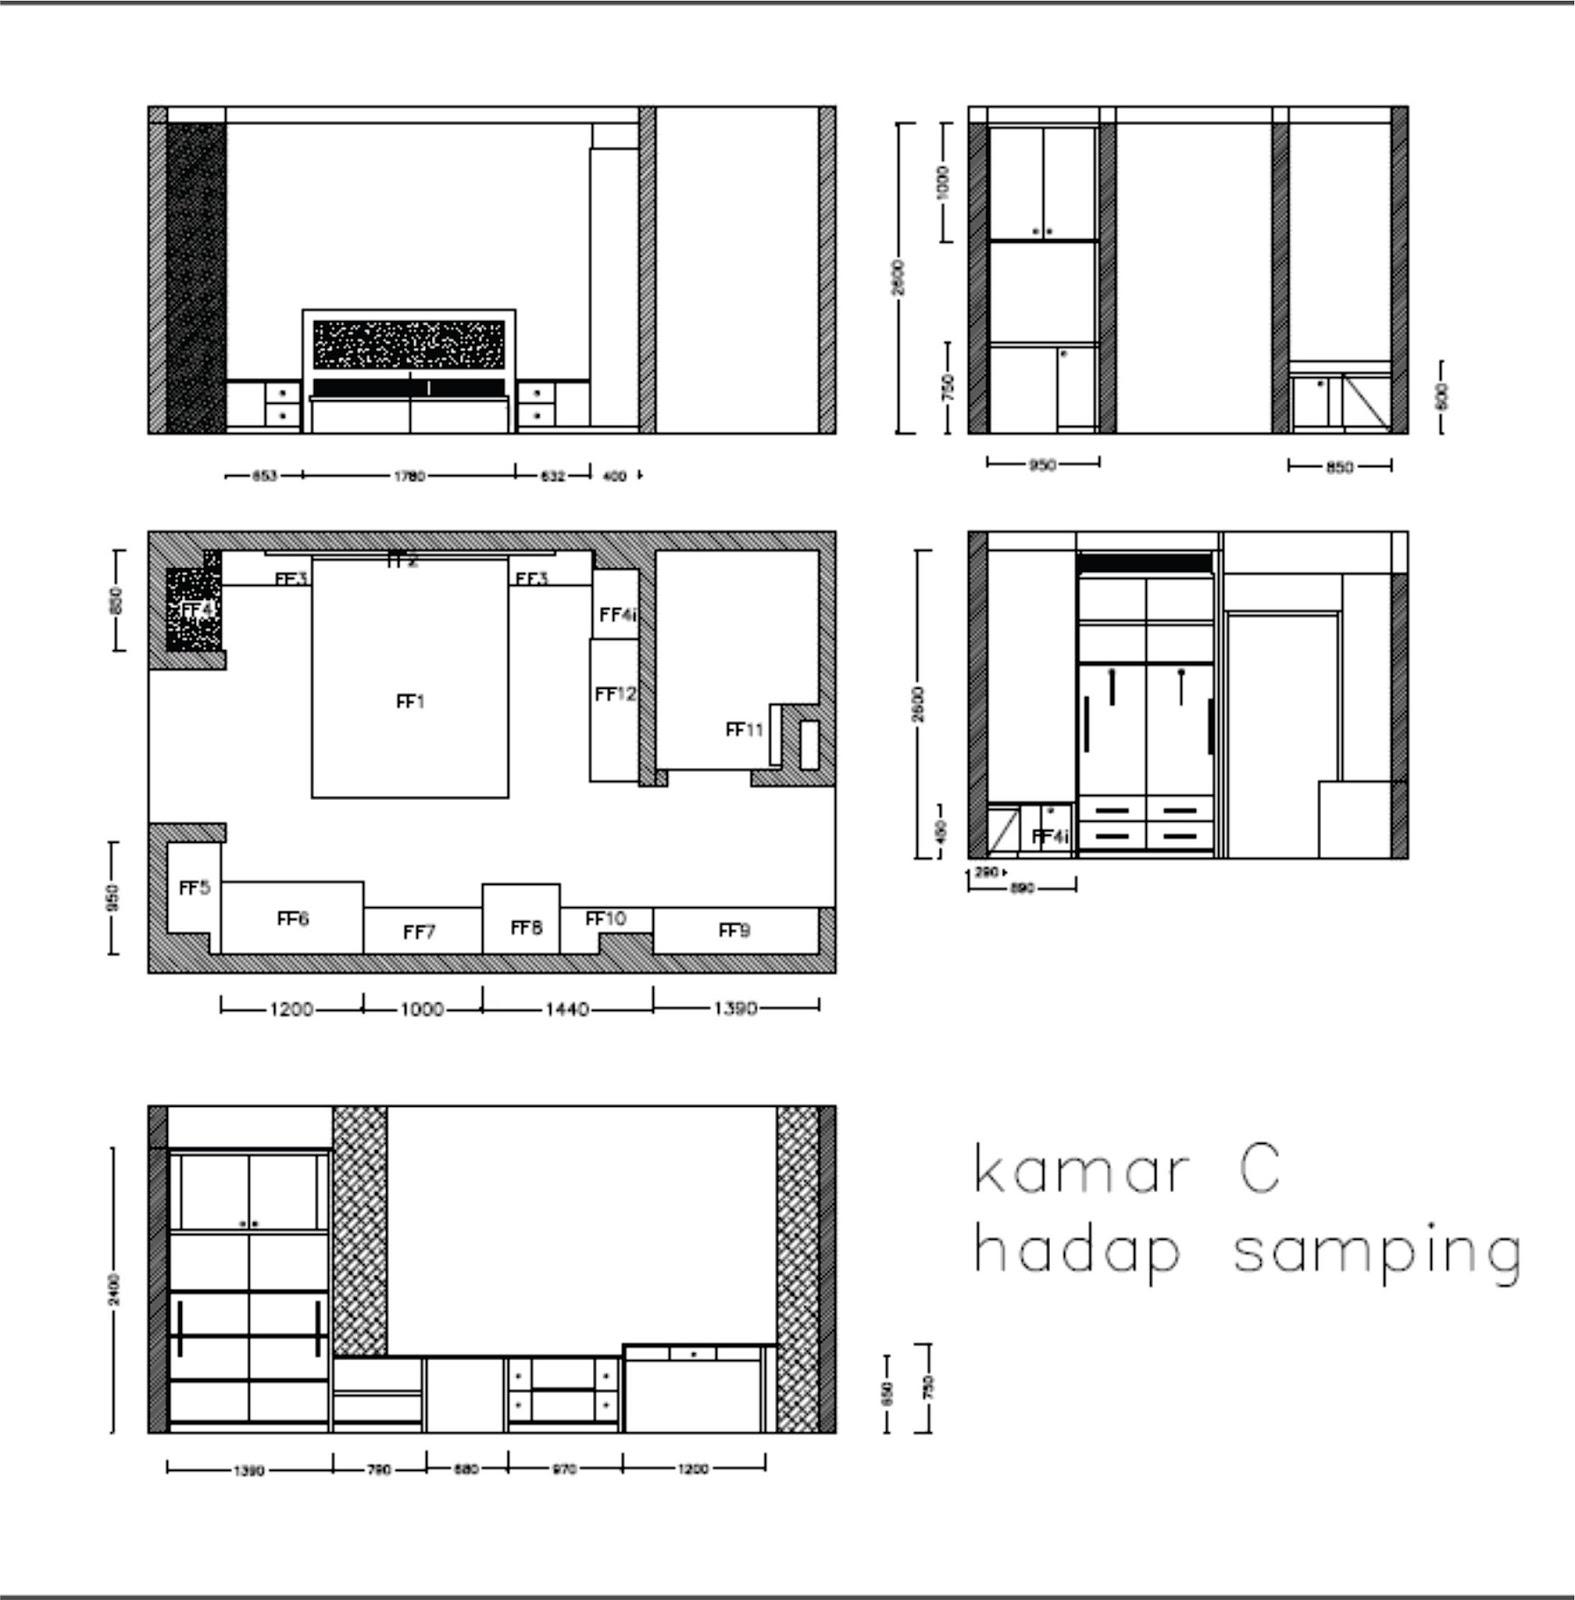 desain interior kamar kos jakarta kamar c hadap samping